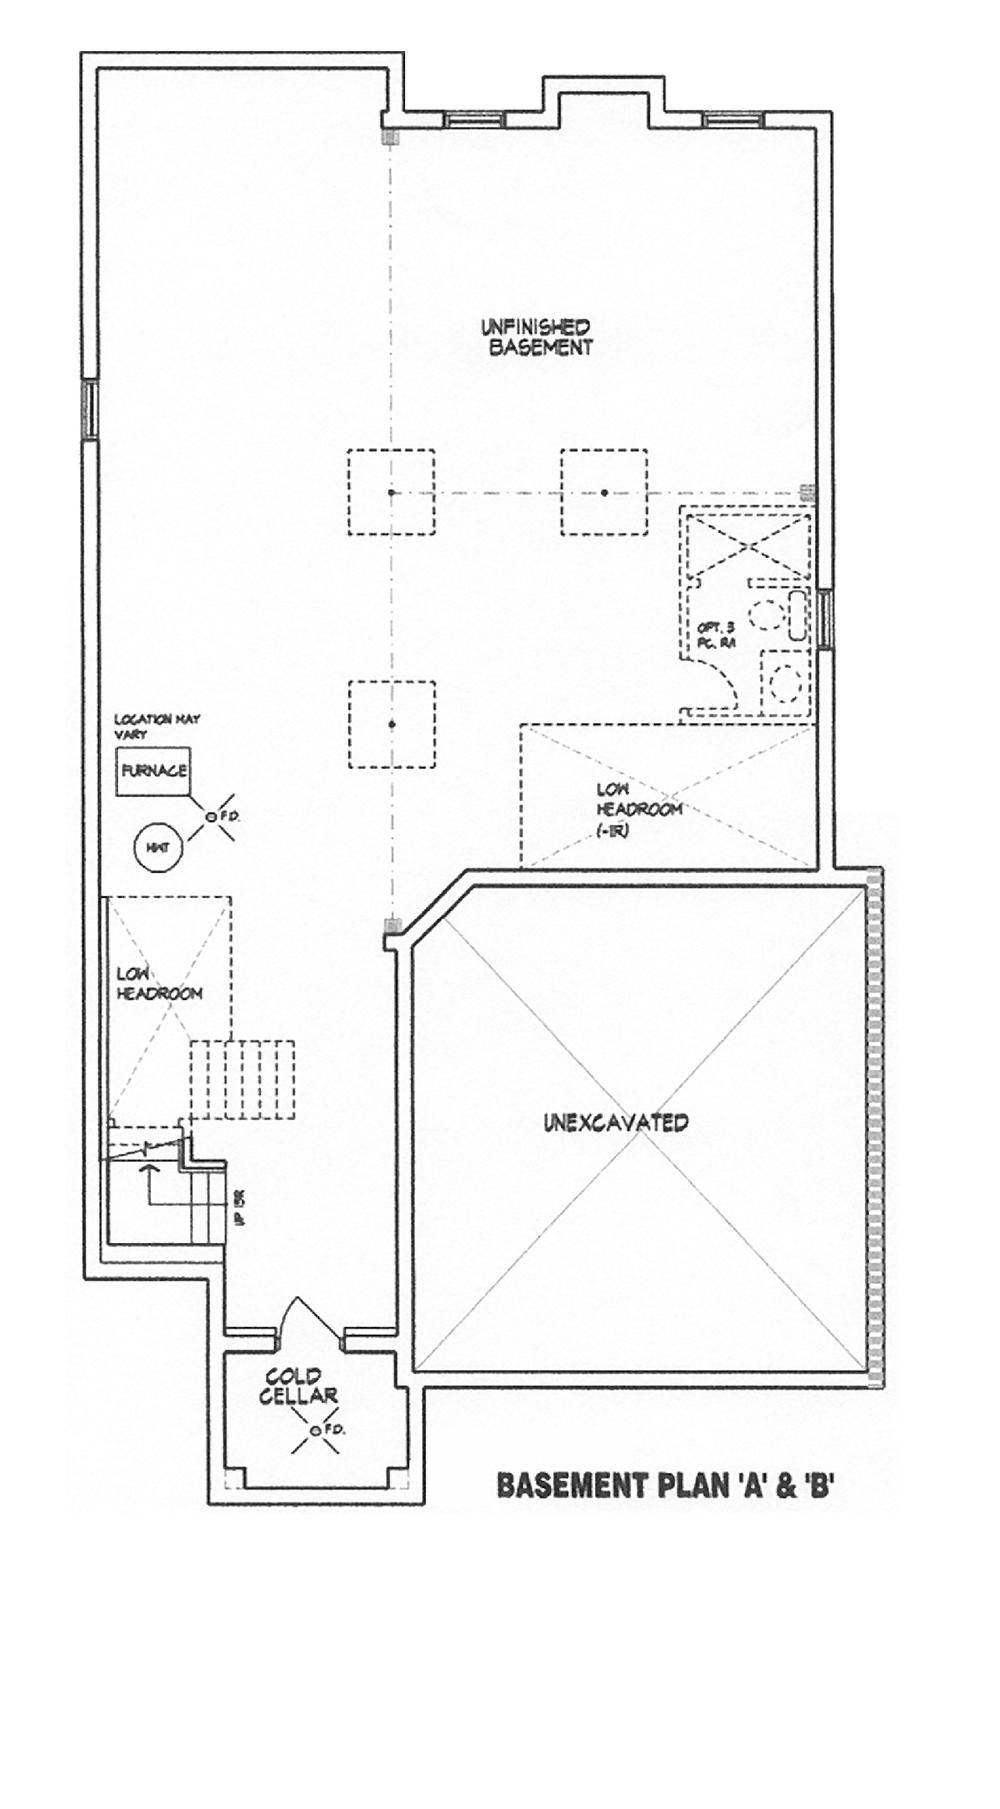 2C. Basement Flr. Plan Bawbiall16.jpg